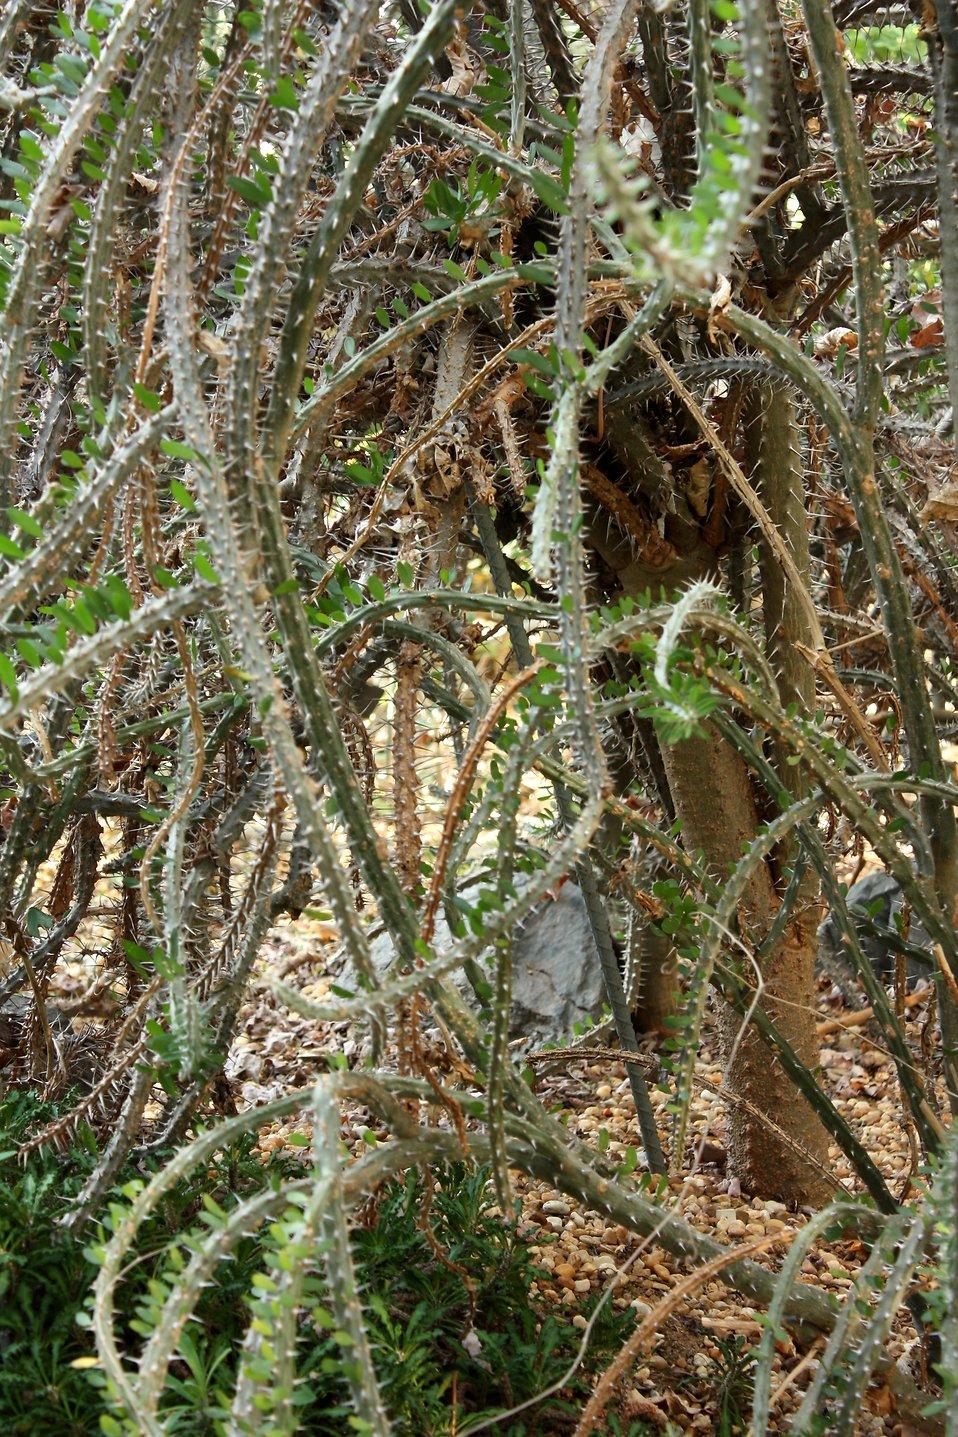 thorny plants